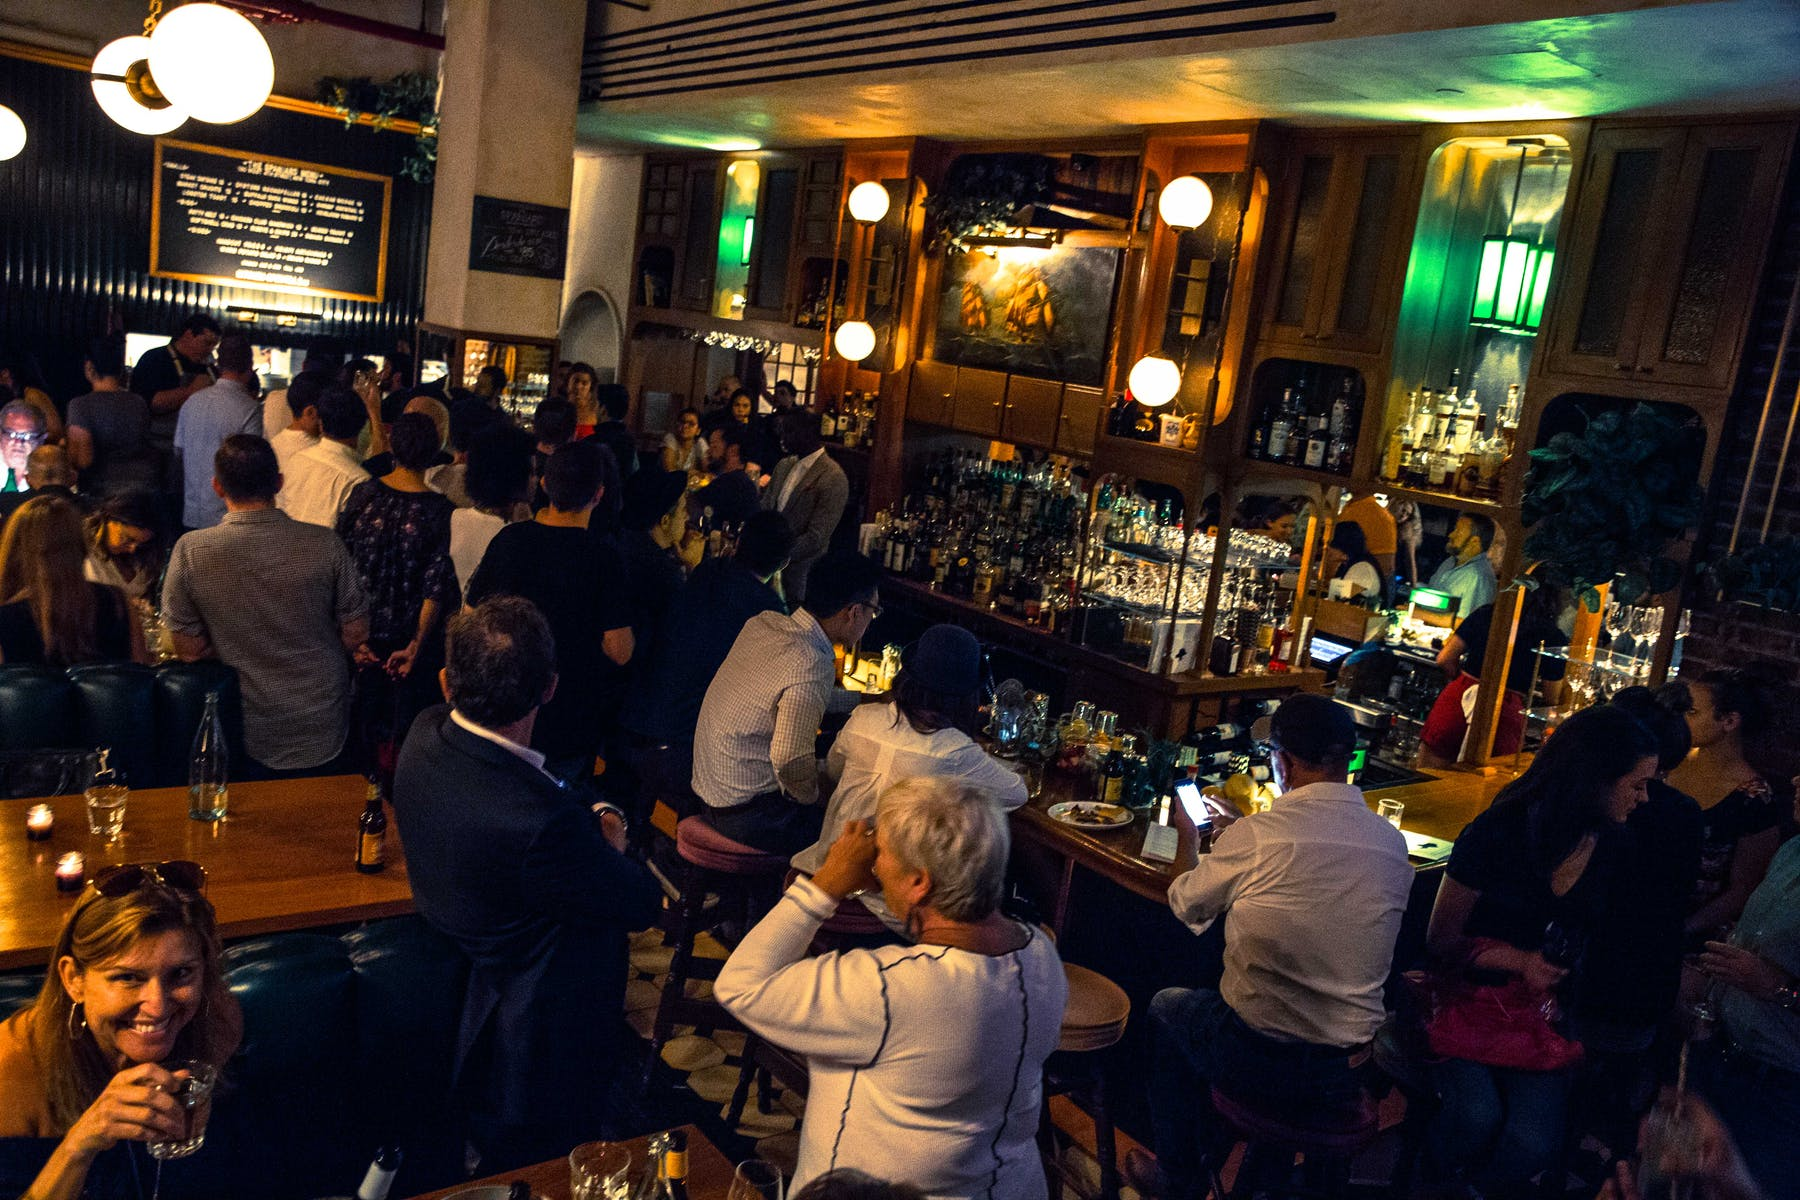 Crowded bar scene